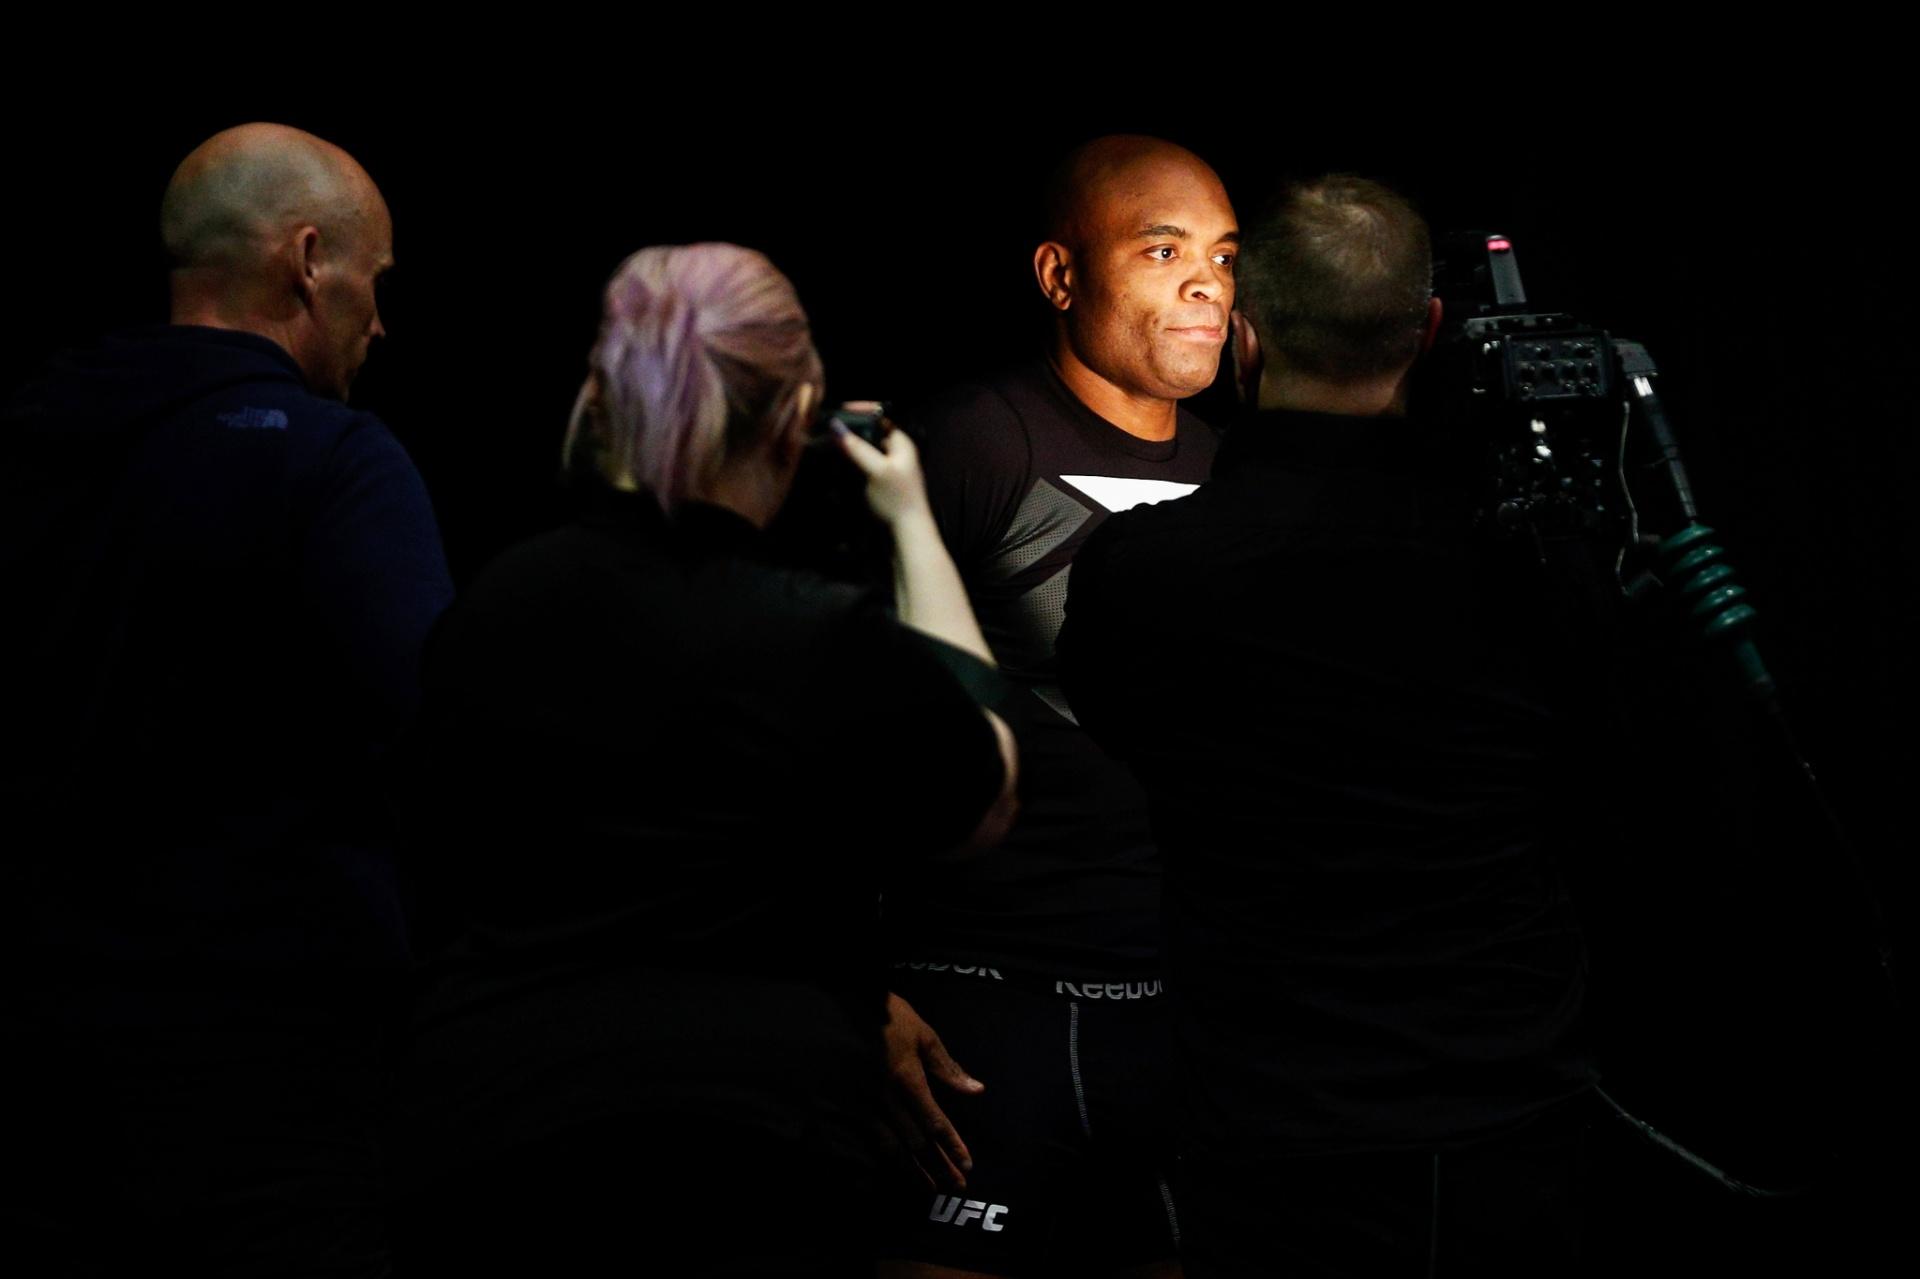 Anderson Silva se prepara para enfrentar Michael Bisping no UFC em Londres